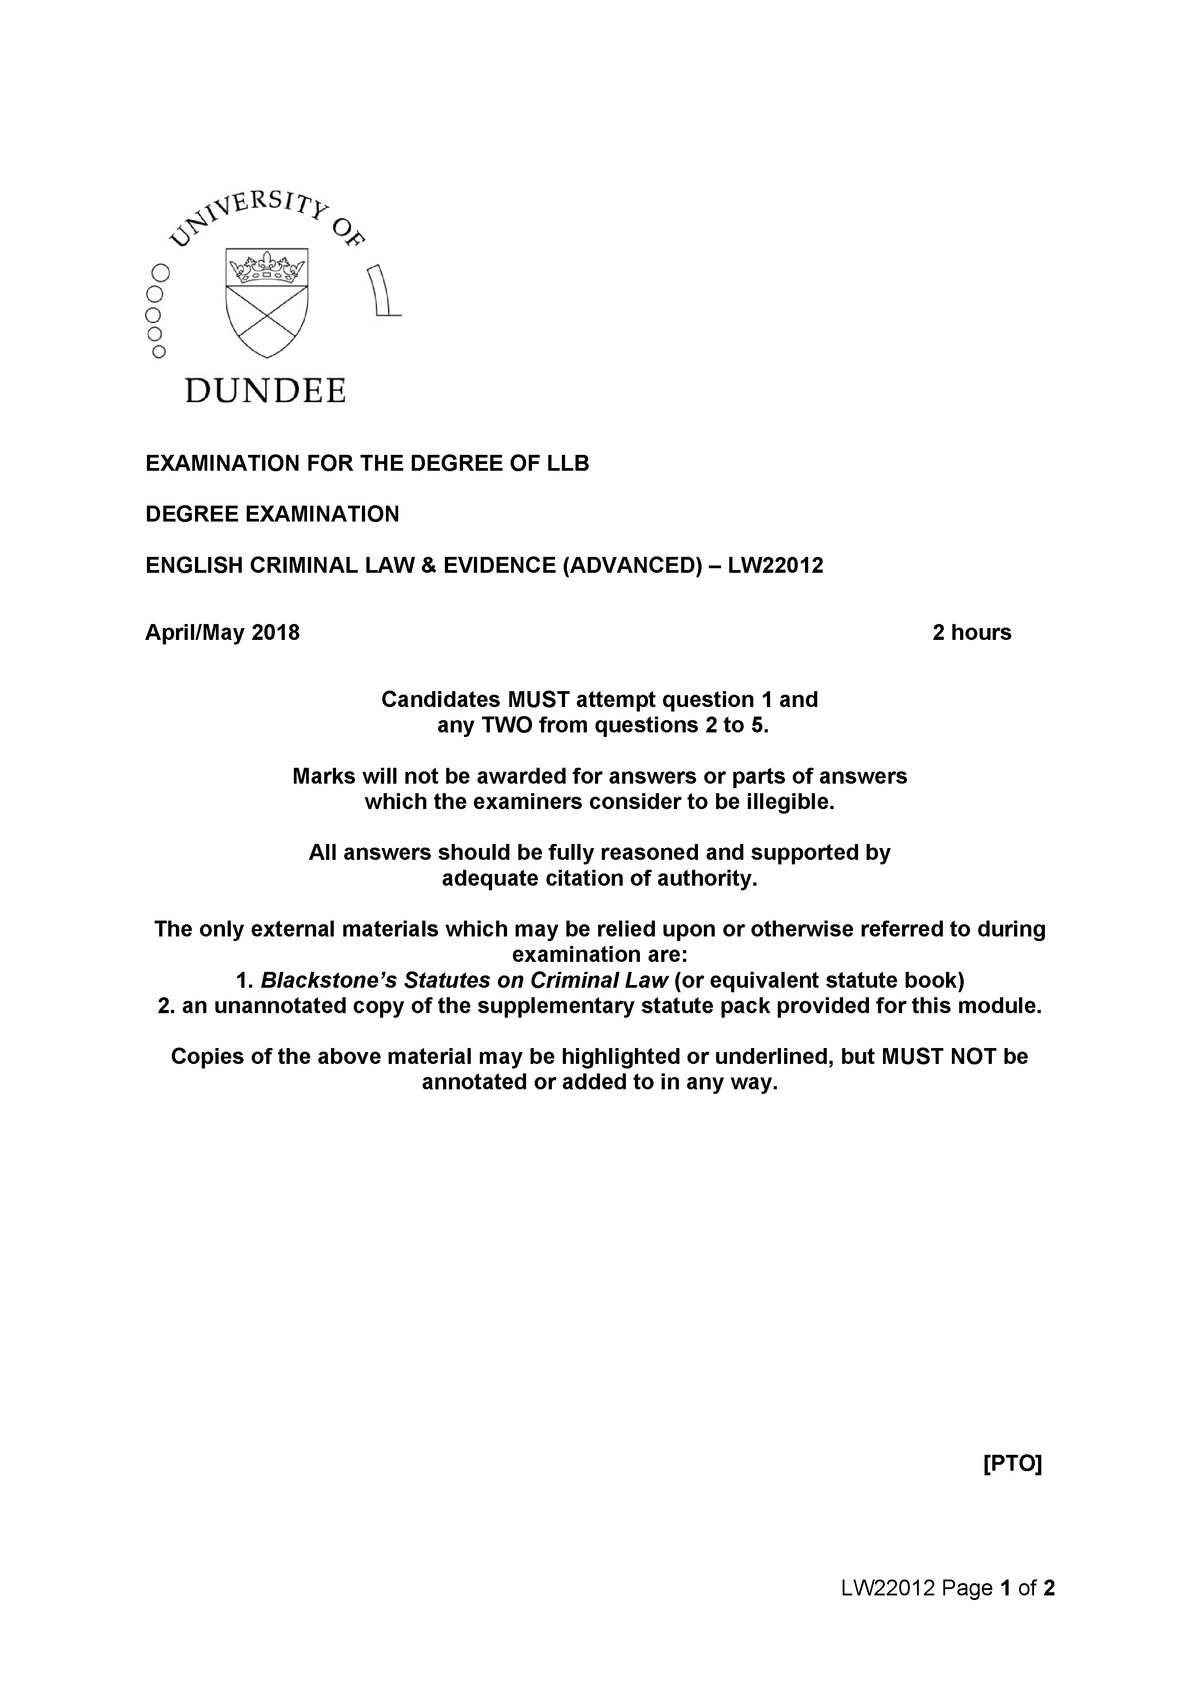 Exam 2018 - LW22012: English Criminal Law and Evidence (Advanced